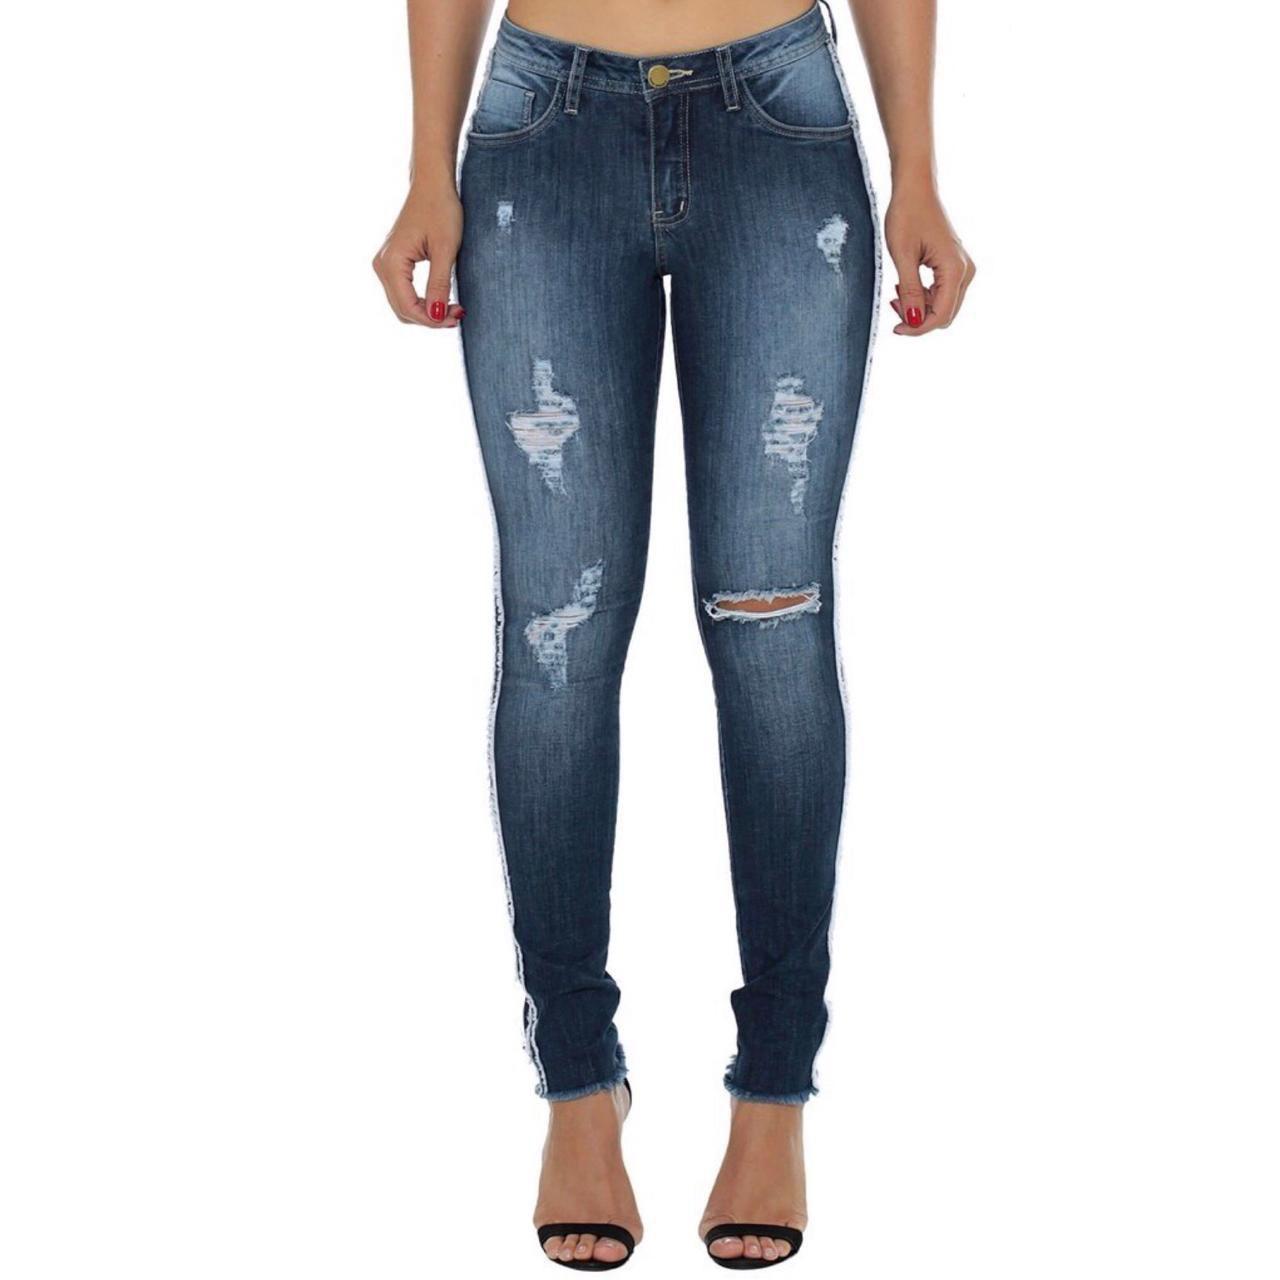 9f56ea6ad Calça Jeans Feminina EVT Skinny Cigarrete Destroyed Eventual ...